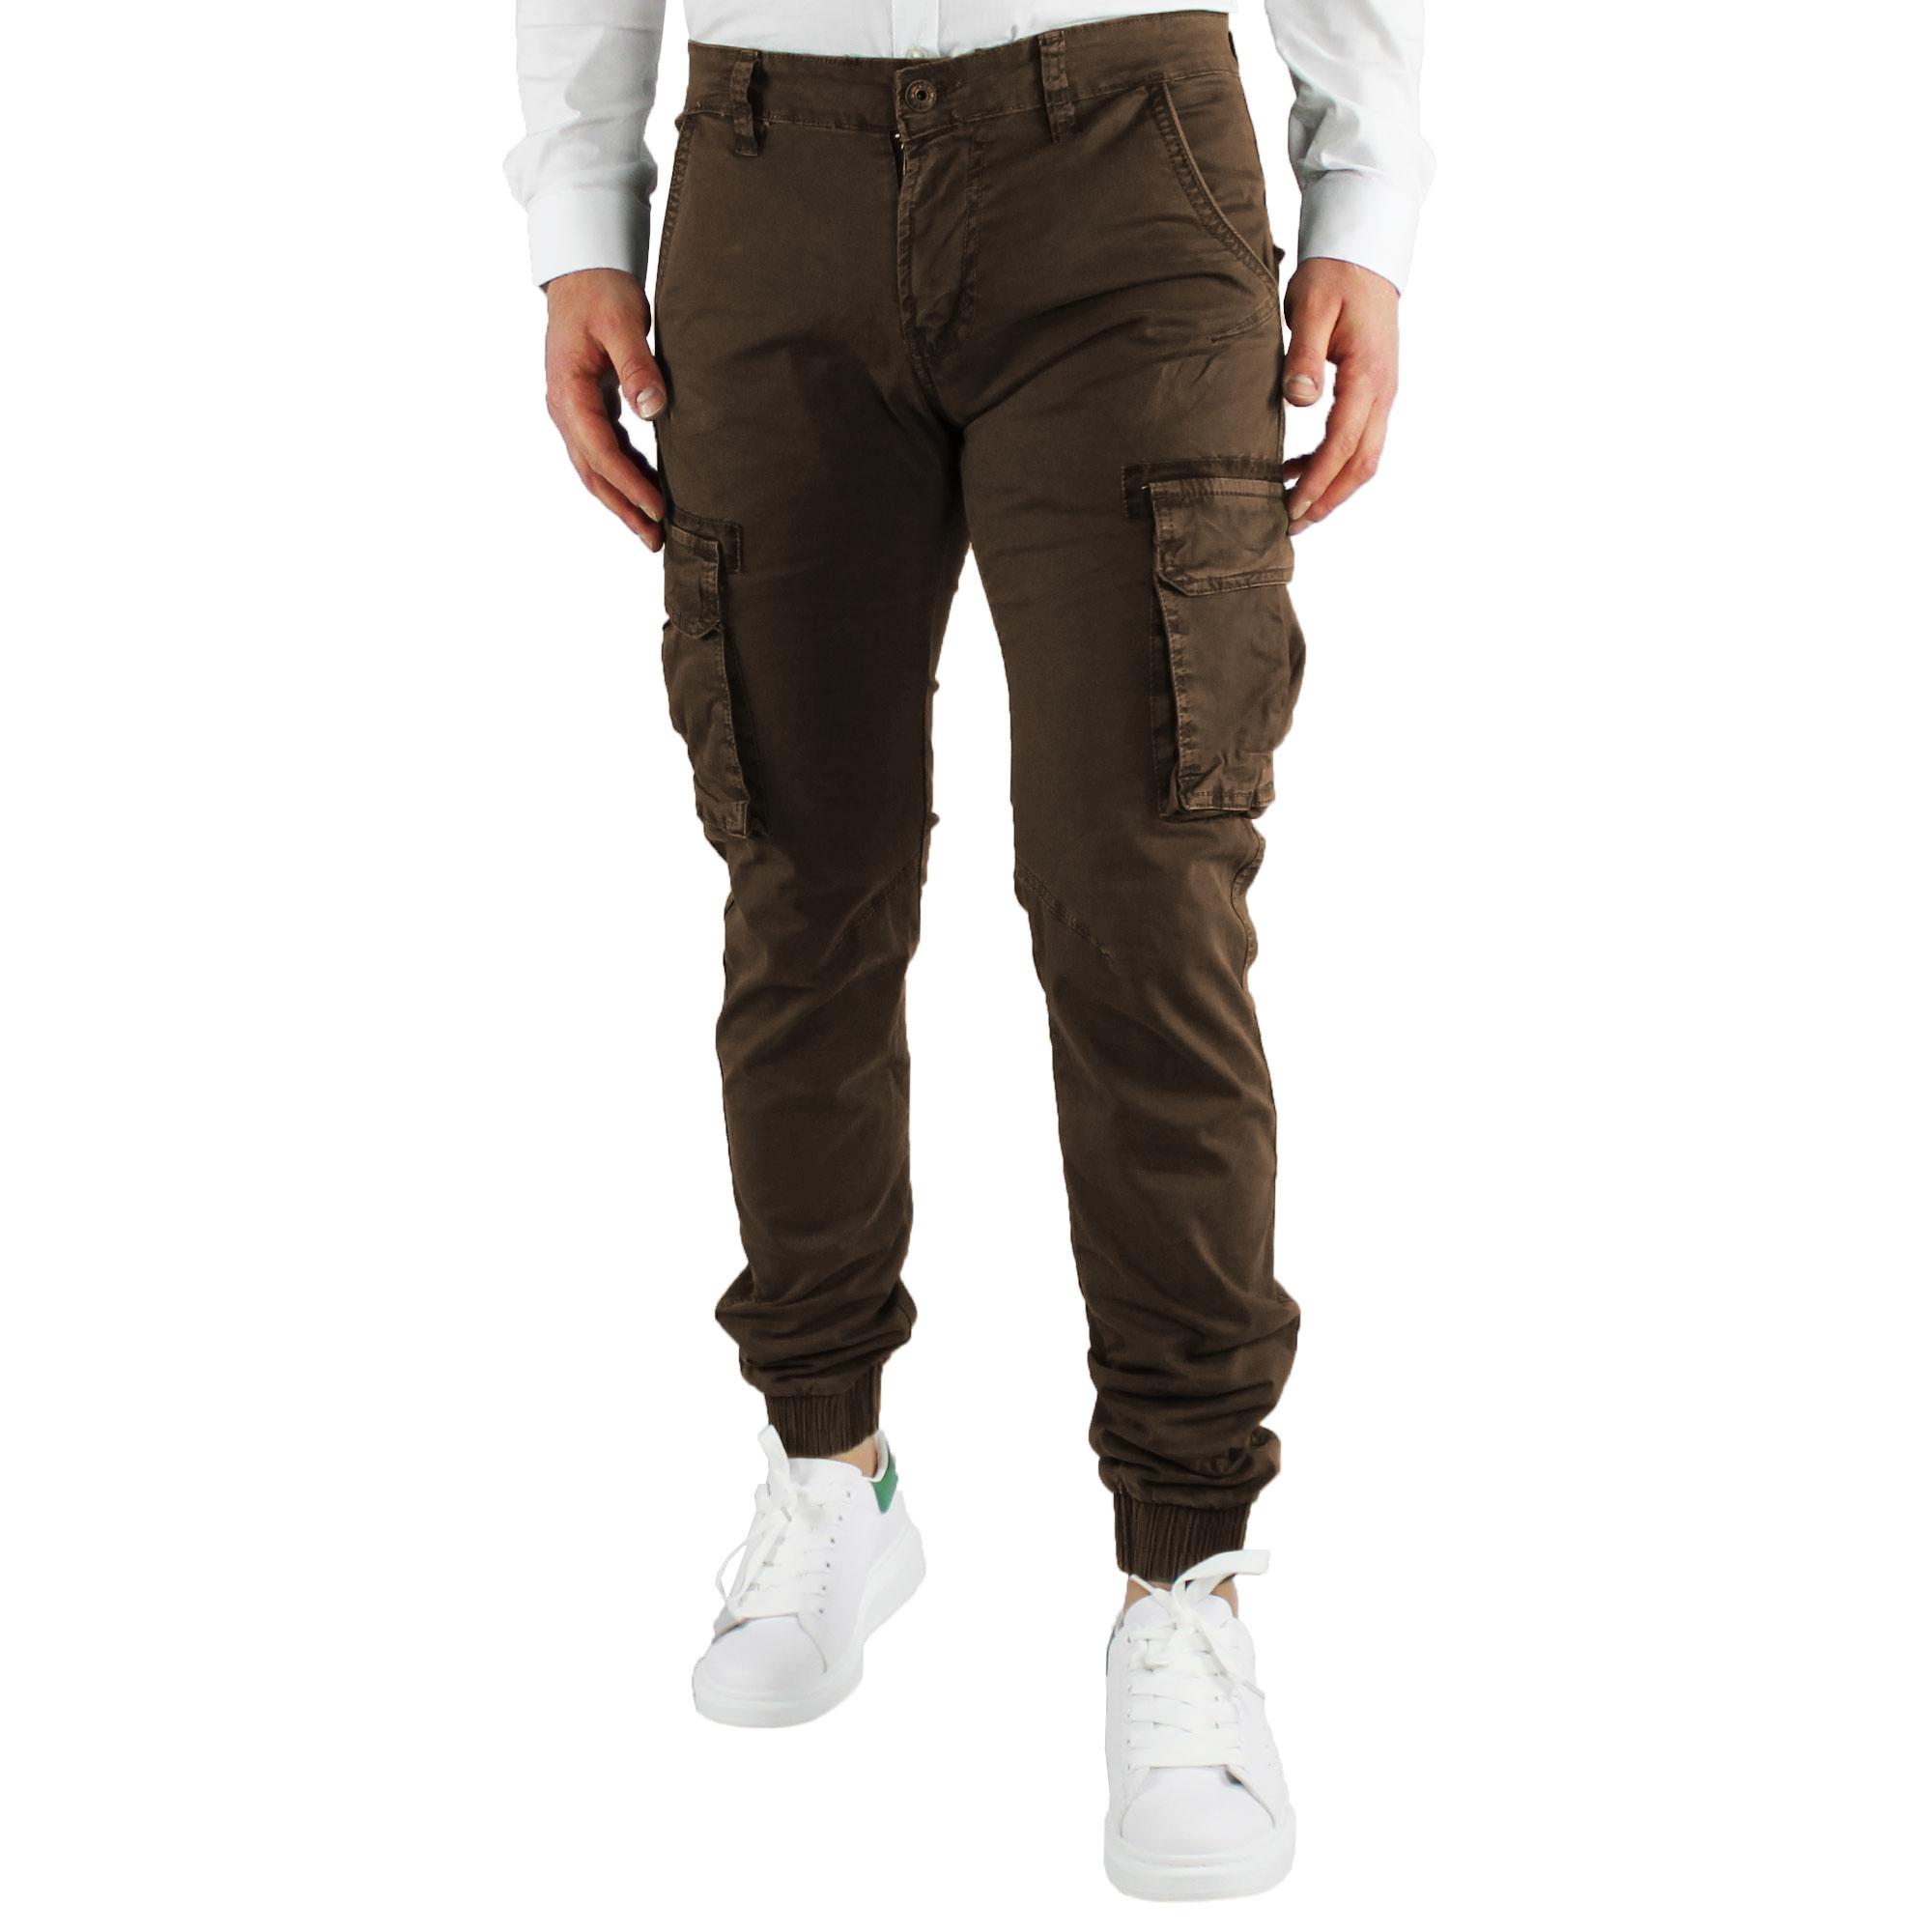 Pantaloni-Uomo-Cargo-Invernali-Pantalone-Tasche-Laterali-SlimFit-Verde-Blu-Fango miniatura 10